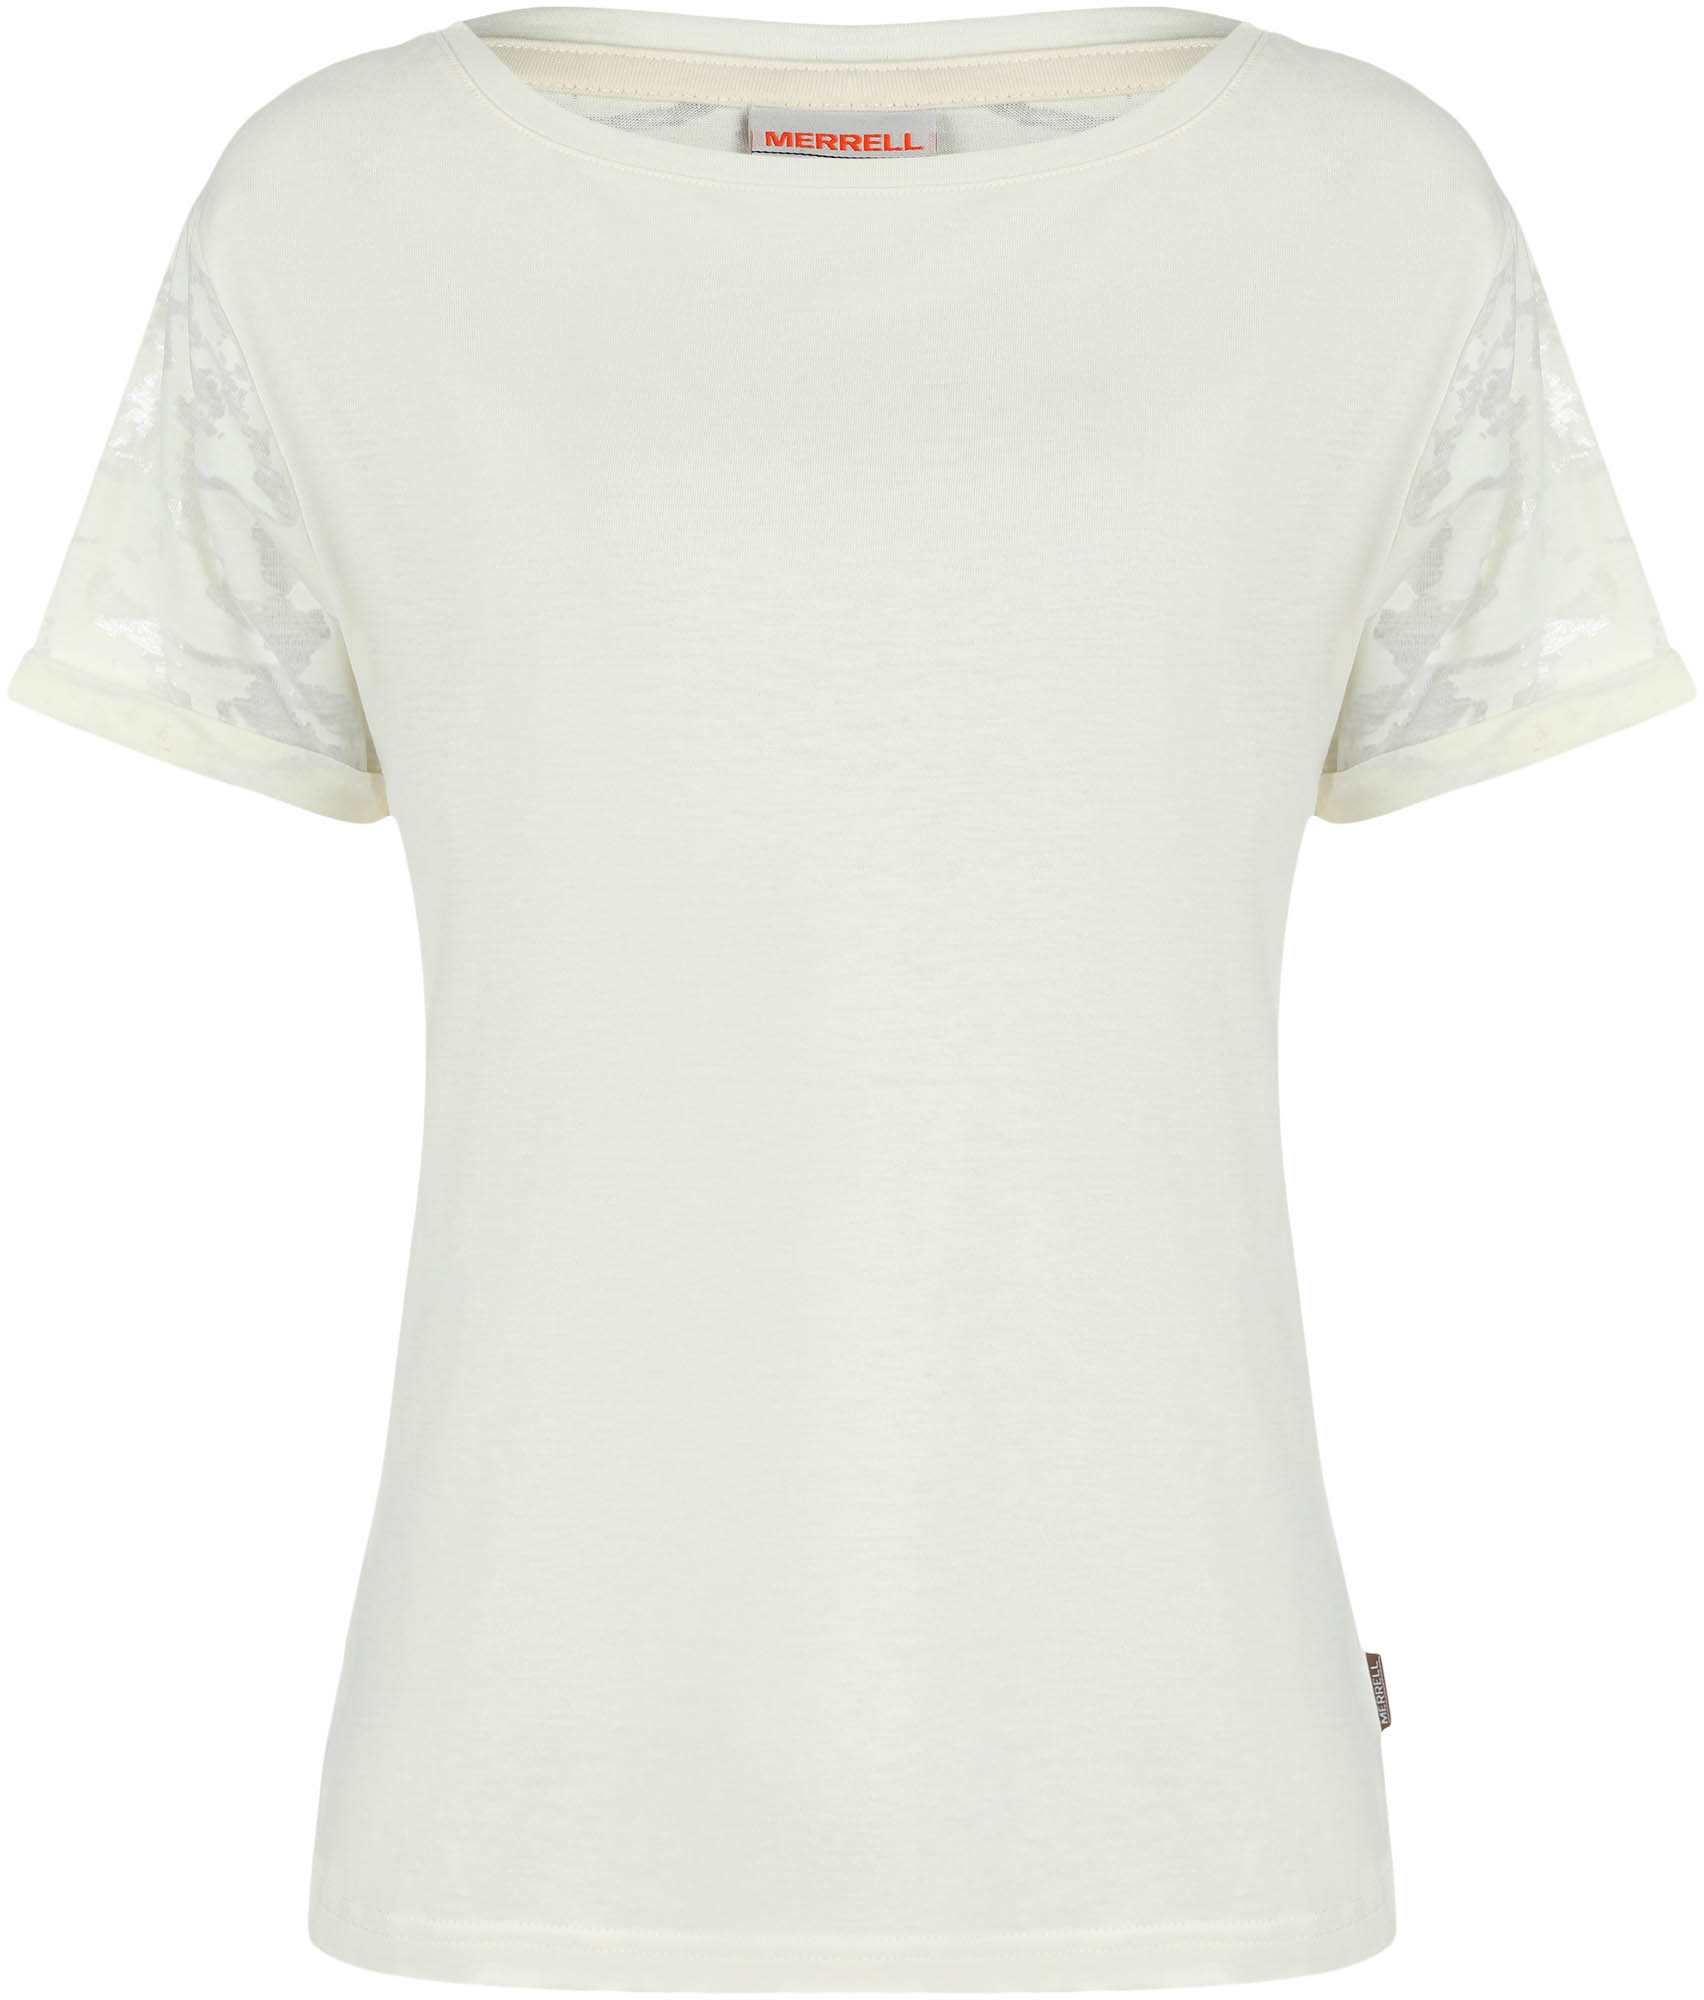 Merrell Футболка женская Merrell, размер 48 xtep женская тонкая воздухопроницаемая спортивная футболка